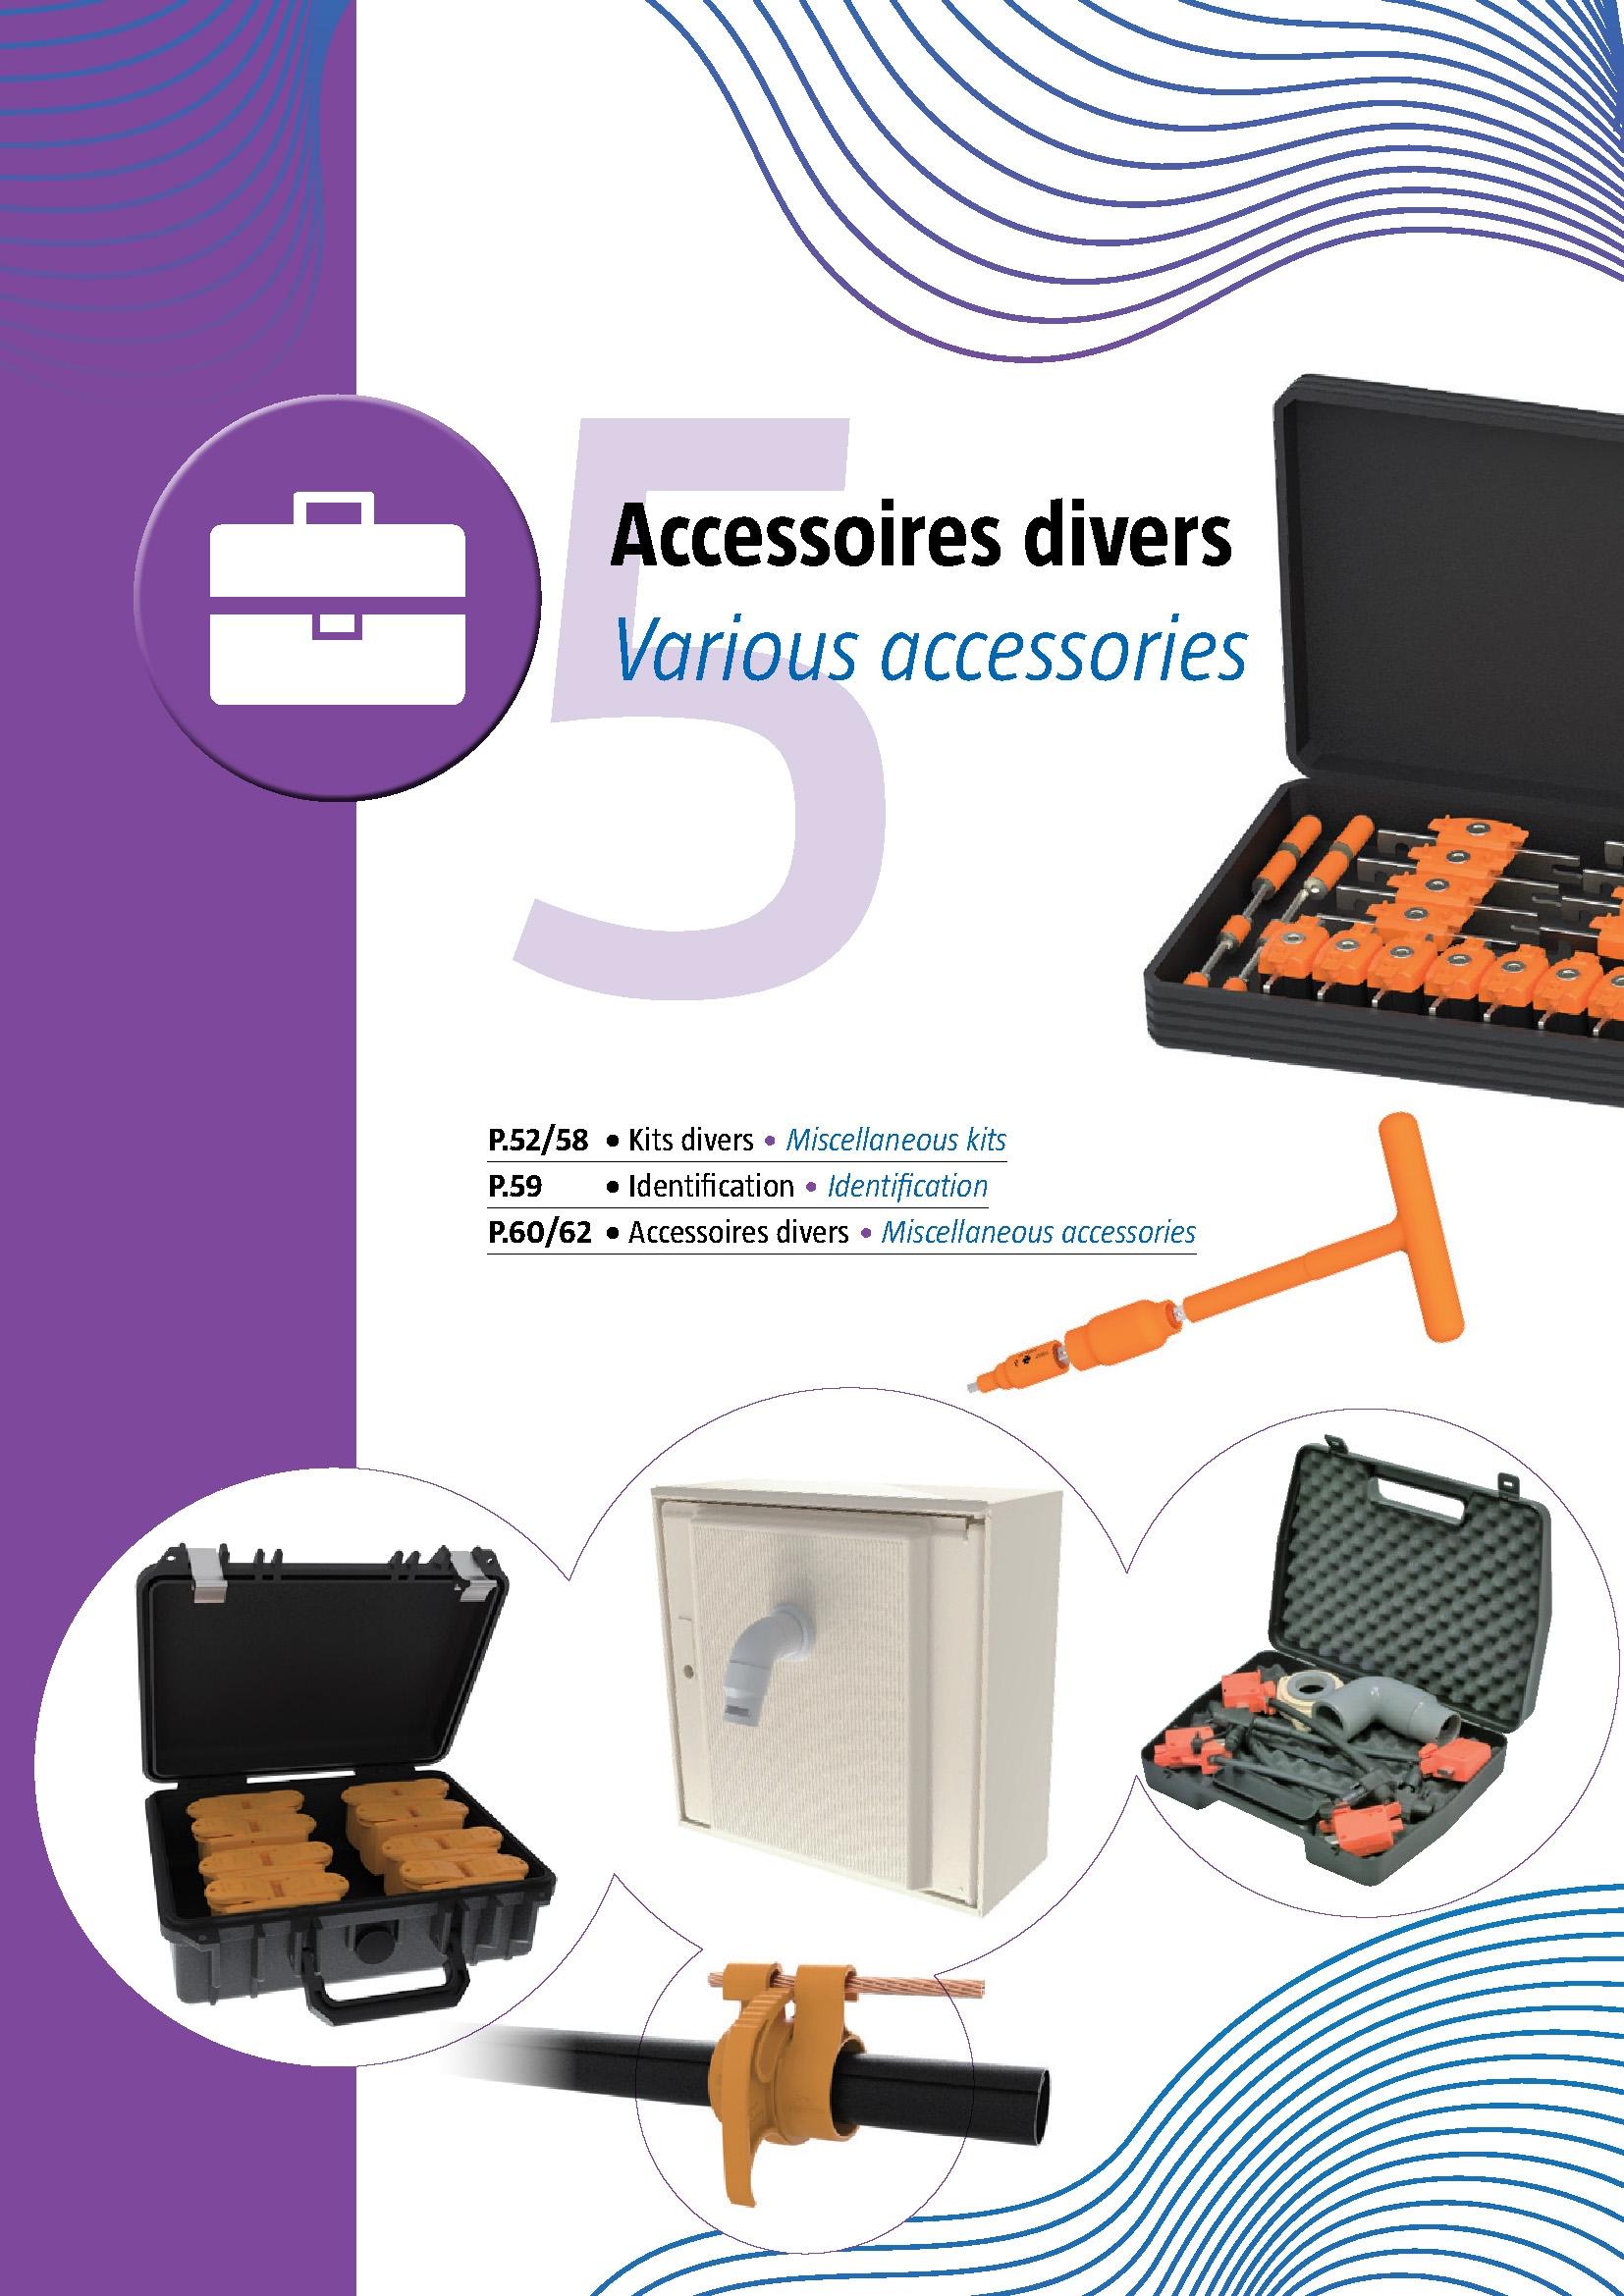 5 Various Accessories